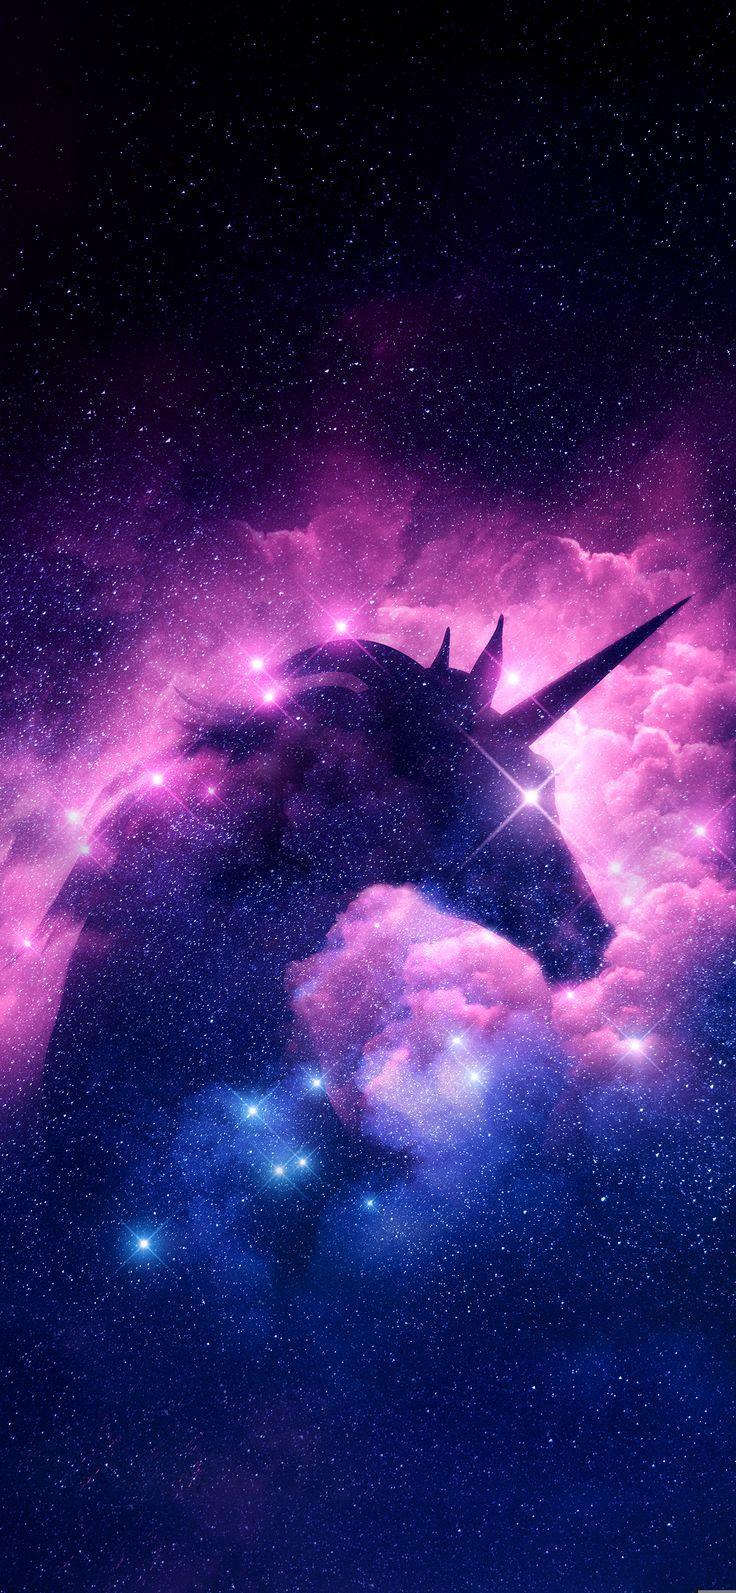 Unicorn Galaxy Iphone Wallpaper Galaxy Iphone Cool